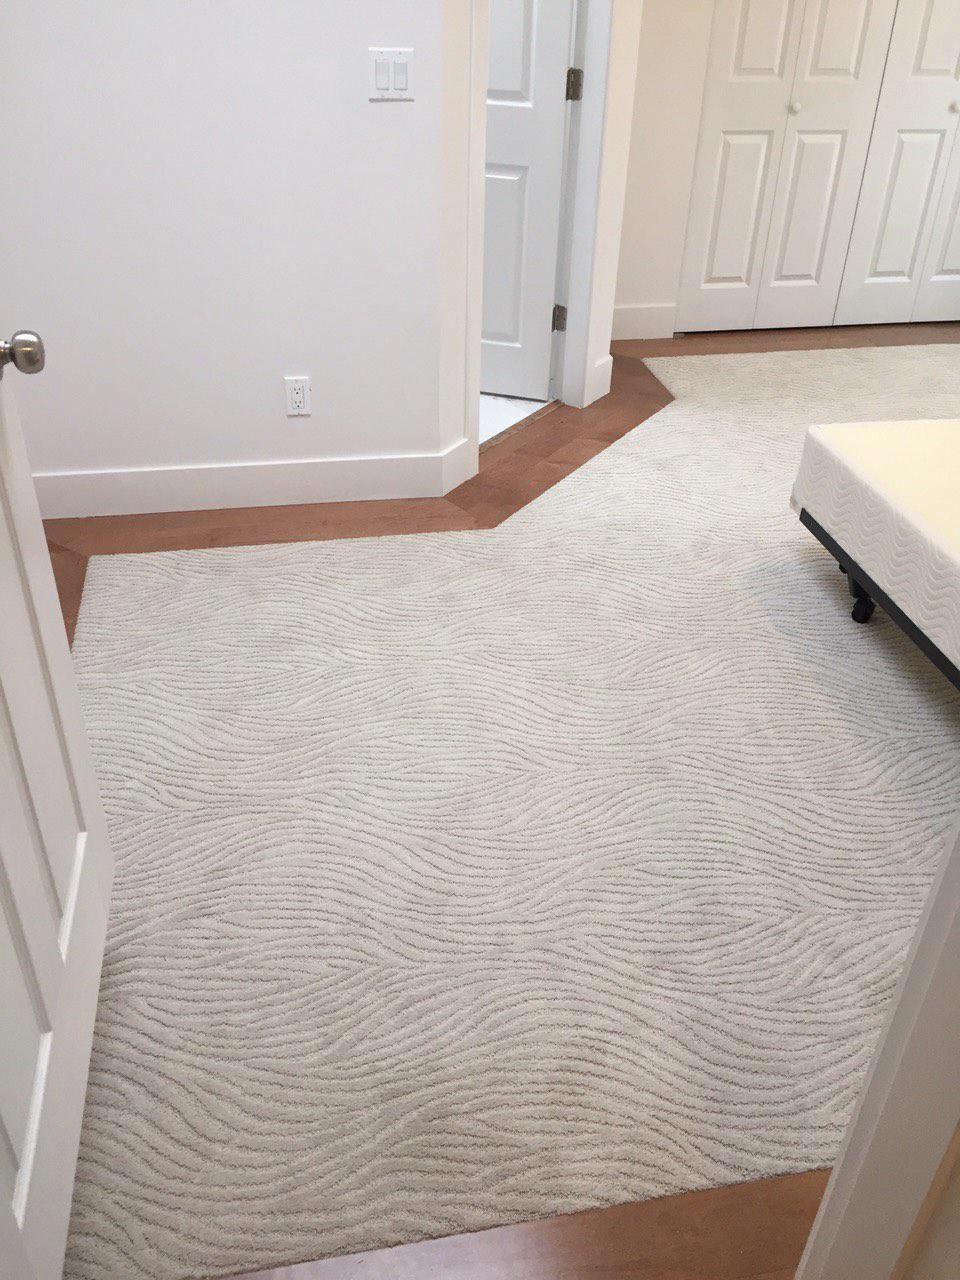 Carpetrunners300cmlong Refferal 6637733607 With Images Bedroom Flooring Carpet Living Room Carpet Hallway Carpet Runners